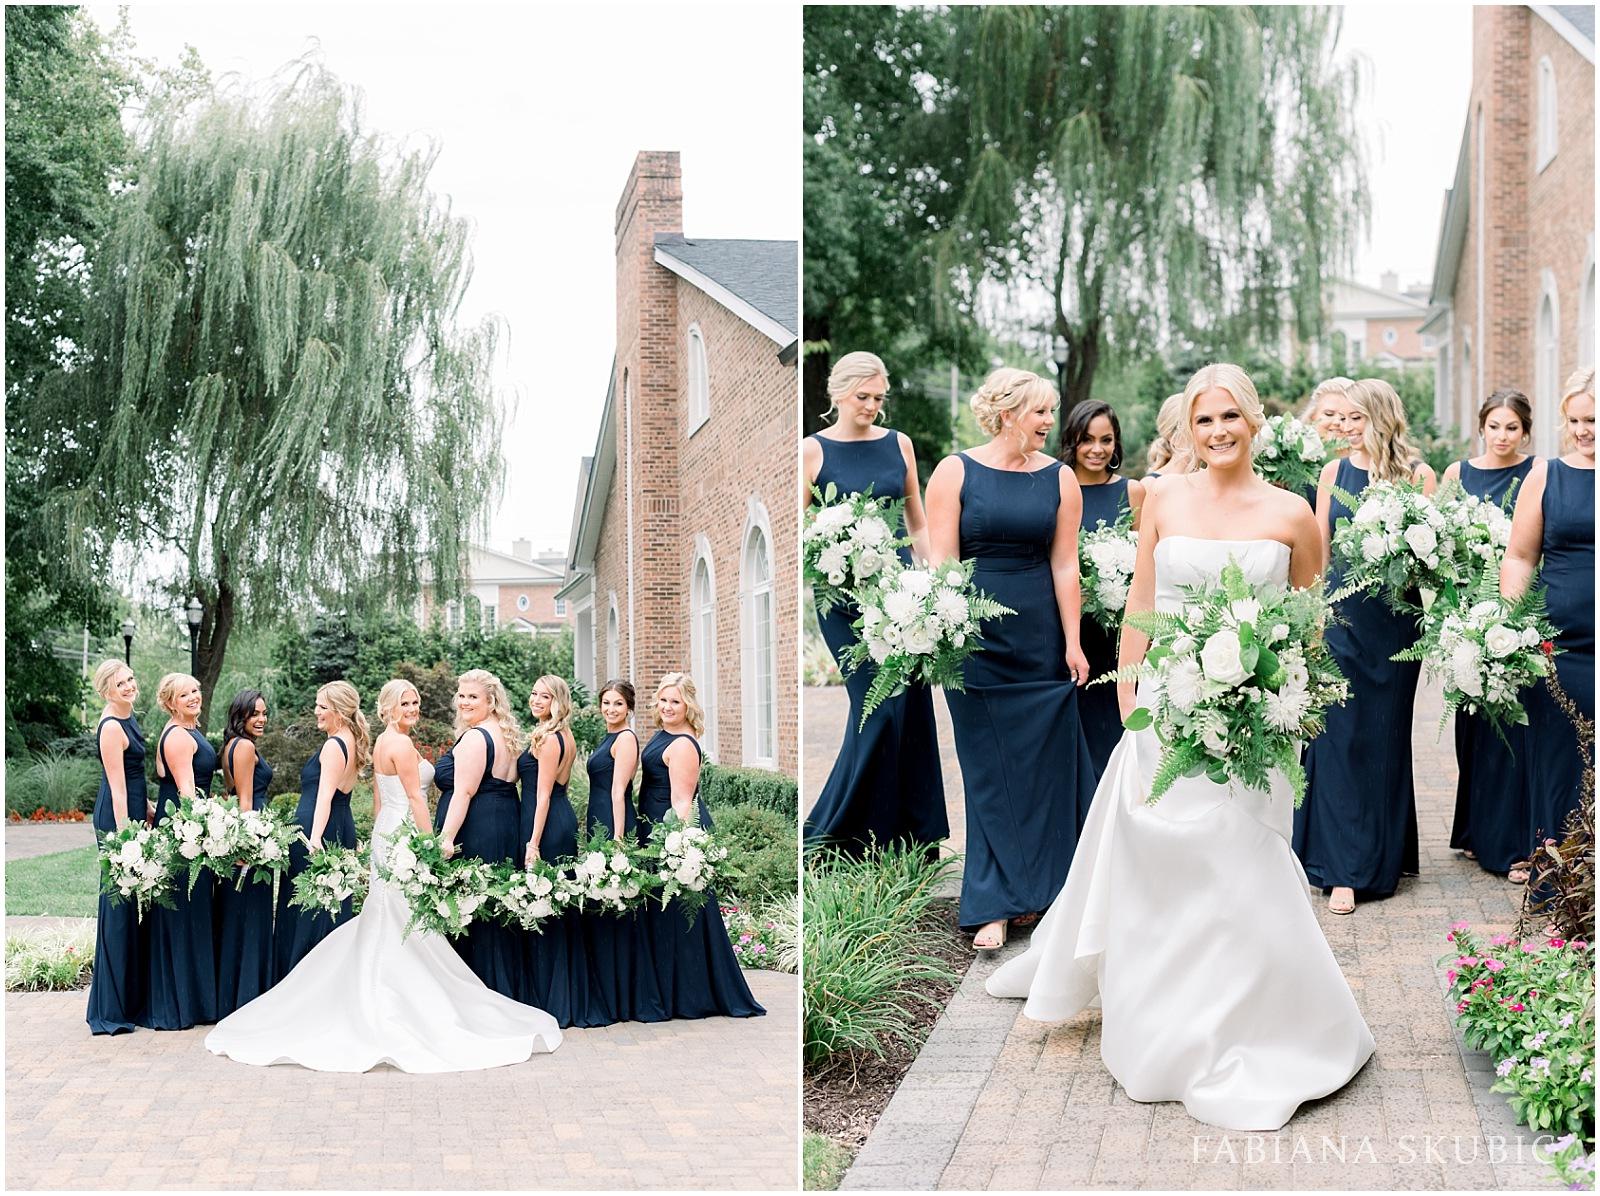 MT-Raleigh-Wedding-Photographer-FSP (57).jpg